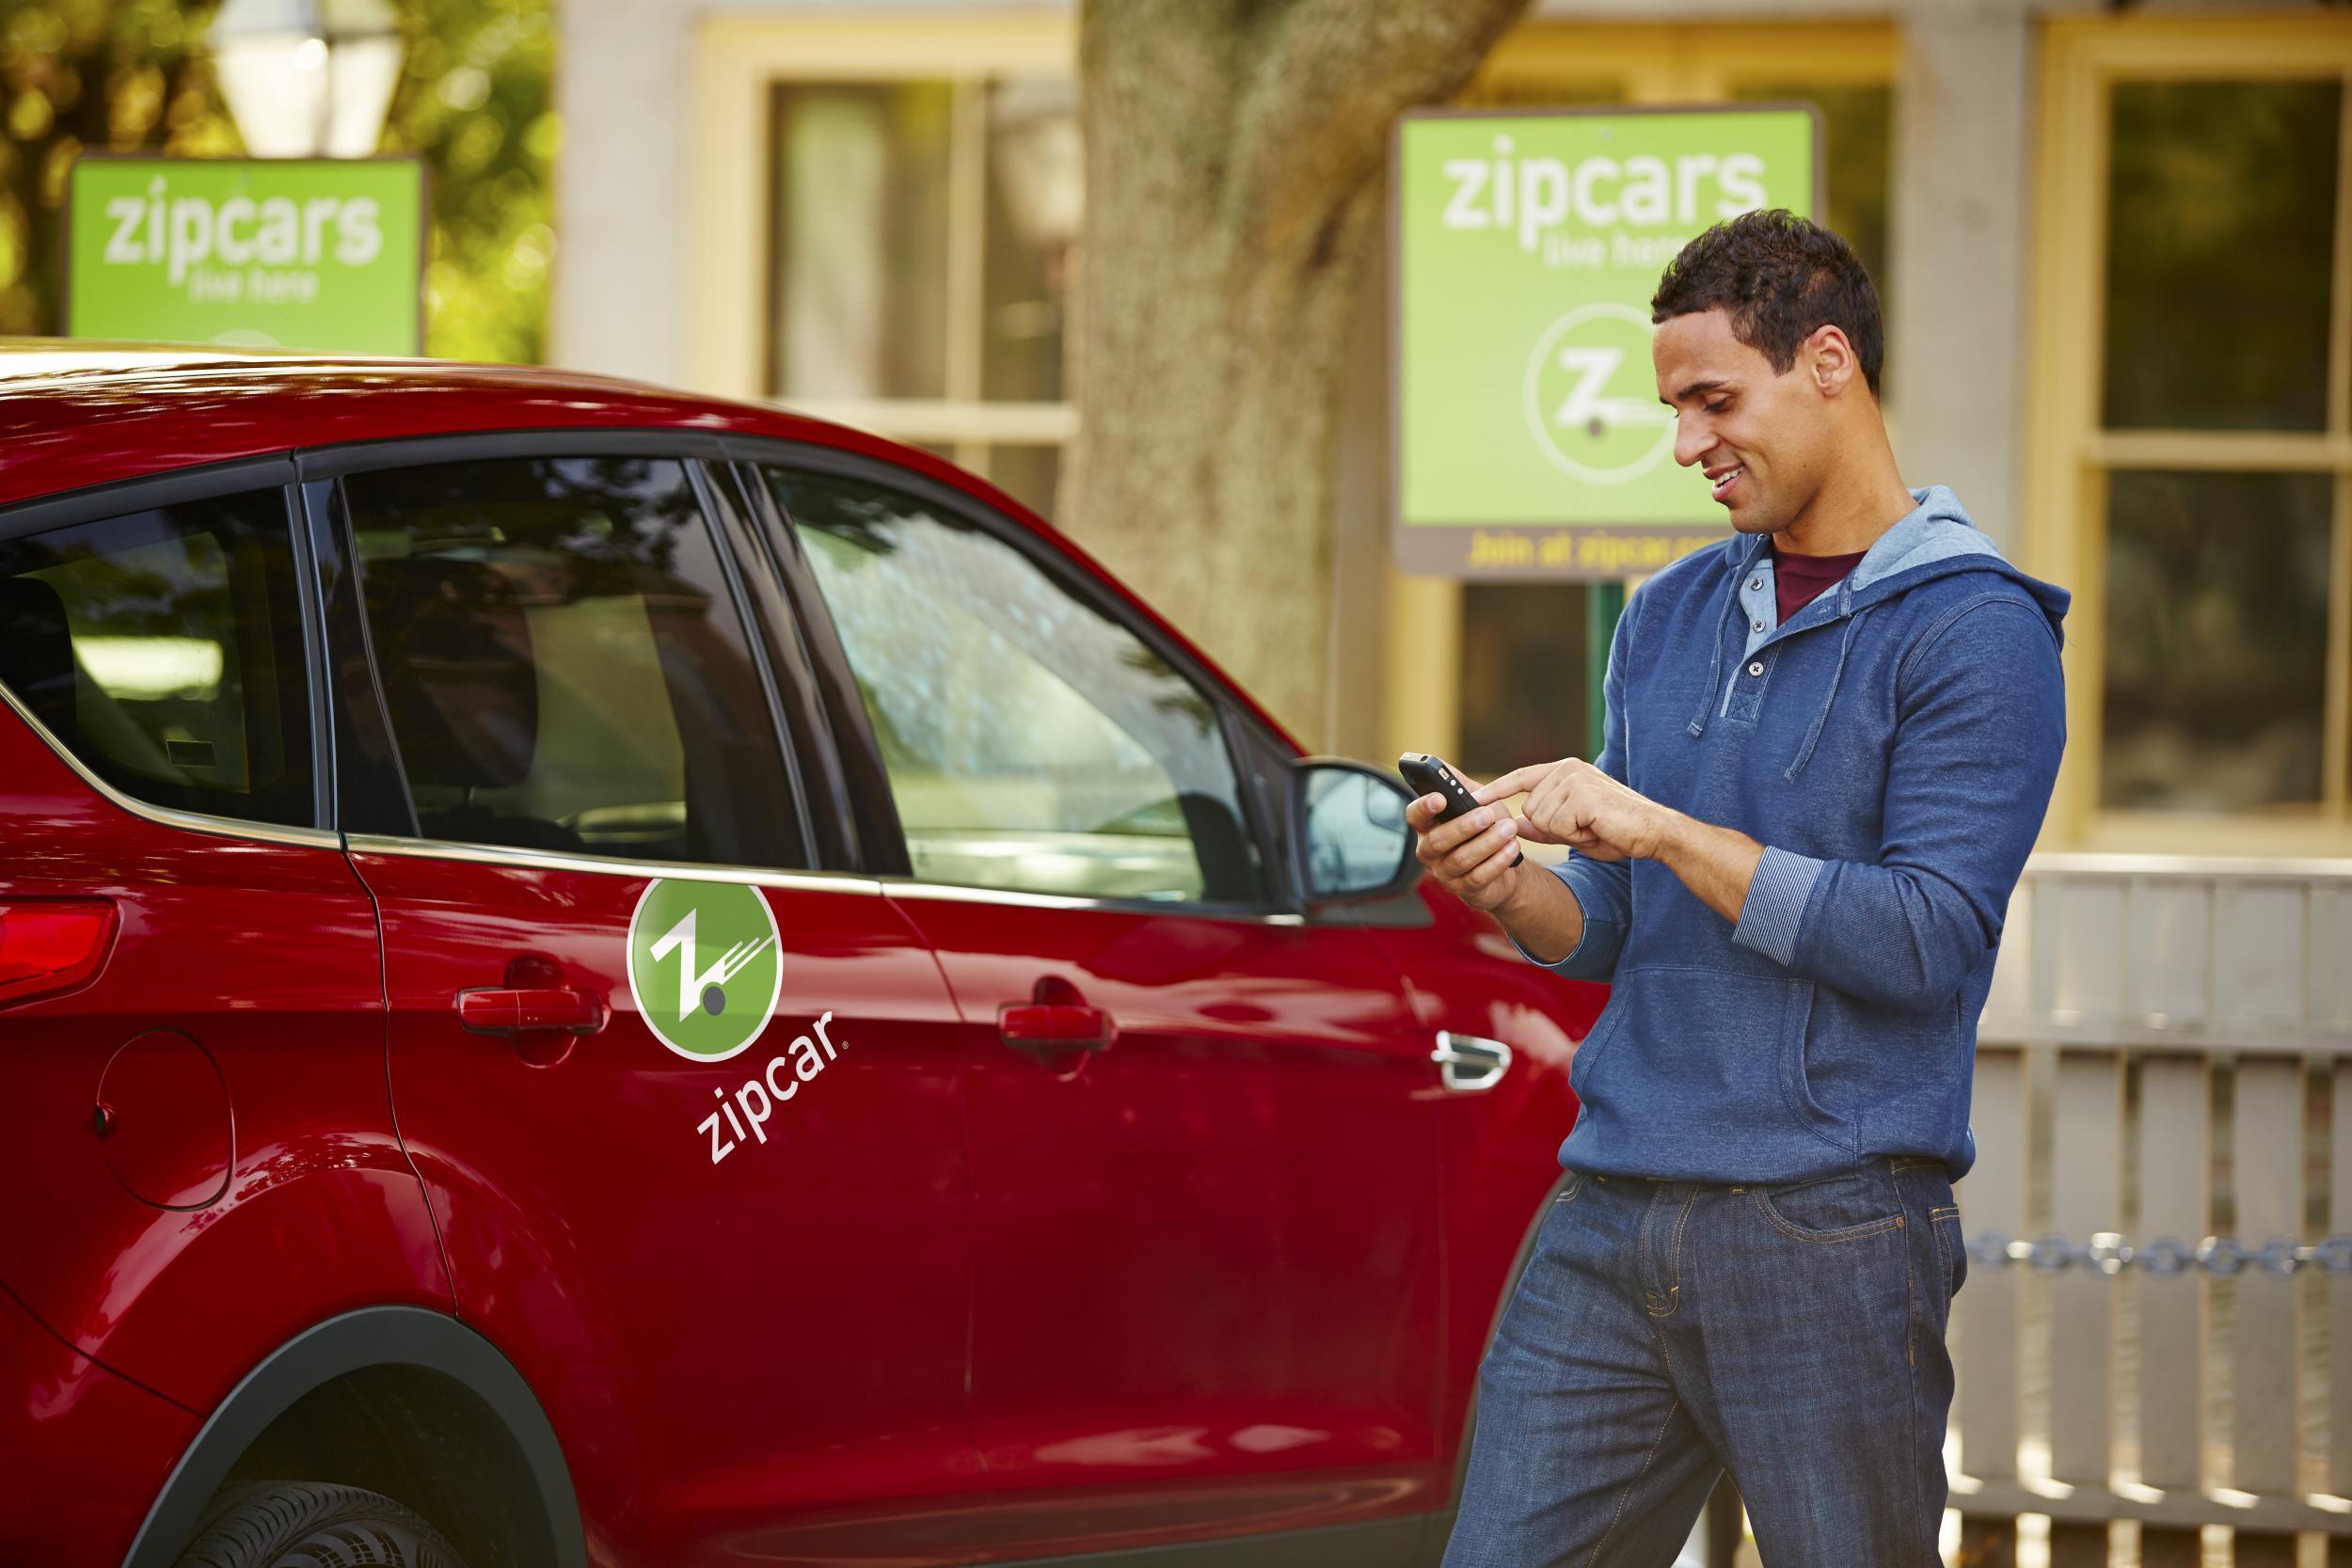 zipcar-consumer-pod-ford-focus